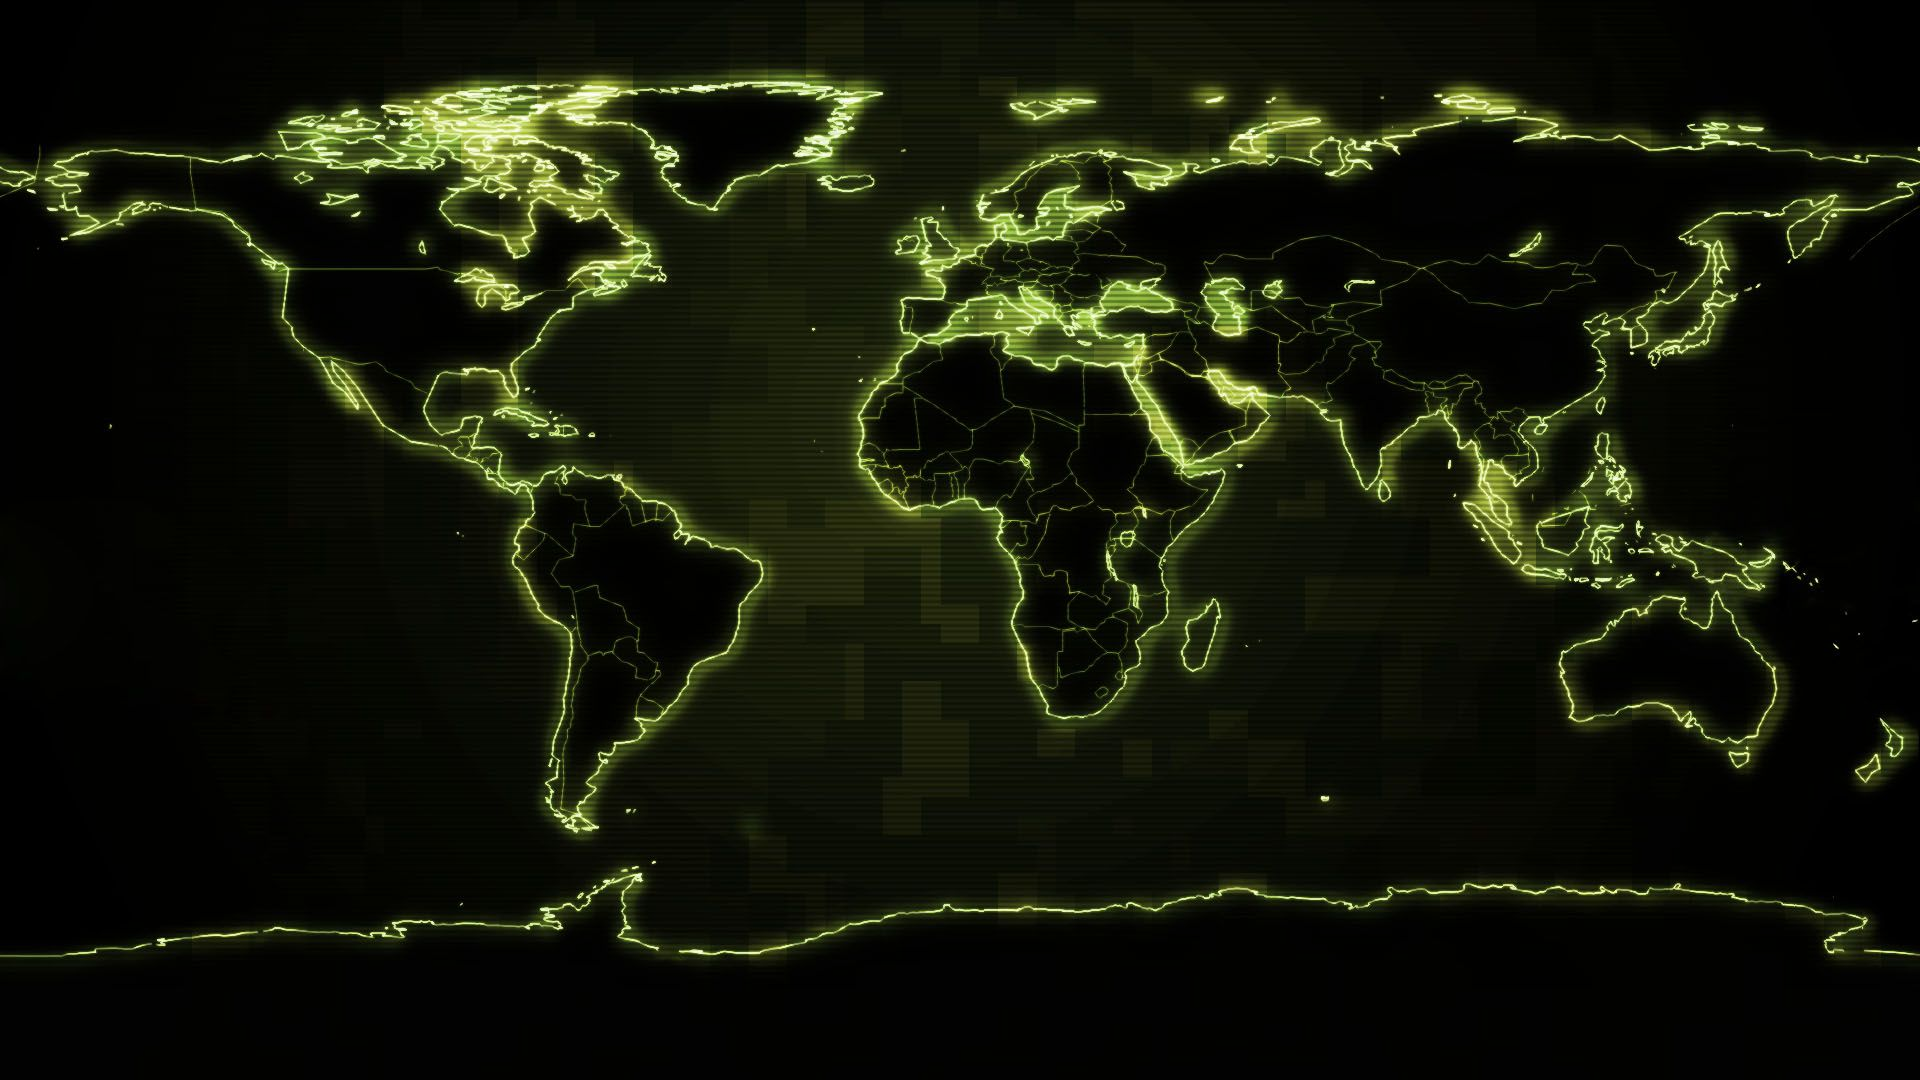 Digital World Map wallpaper   United Nations   191020113 1920x1080